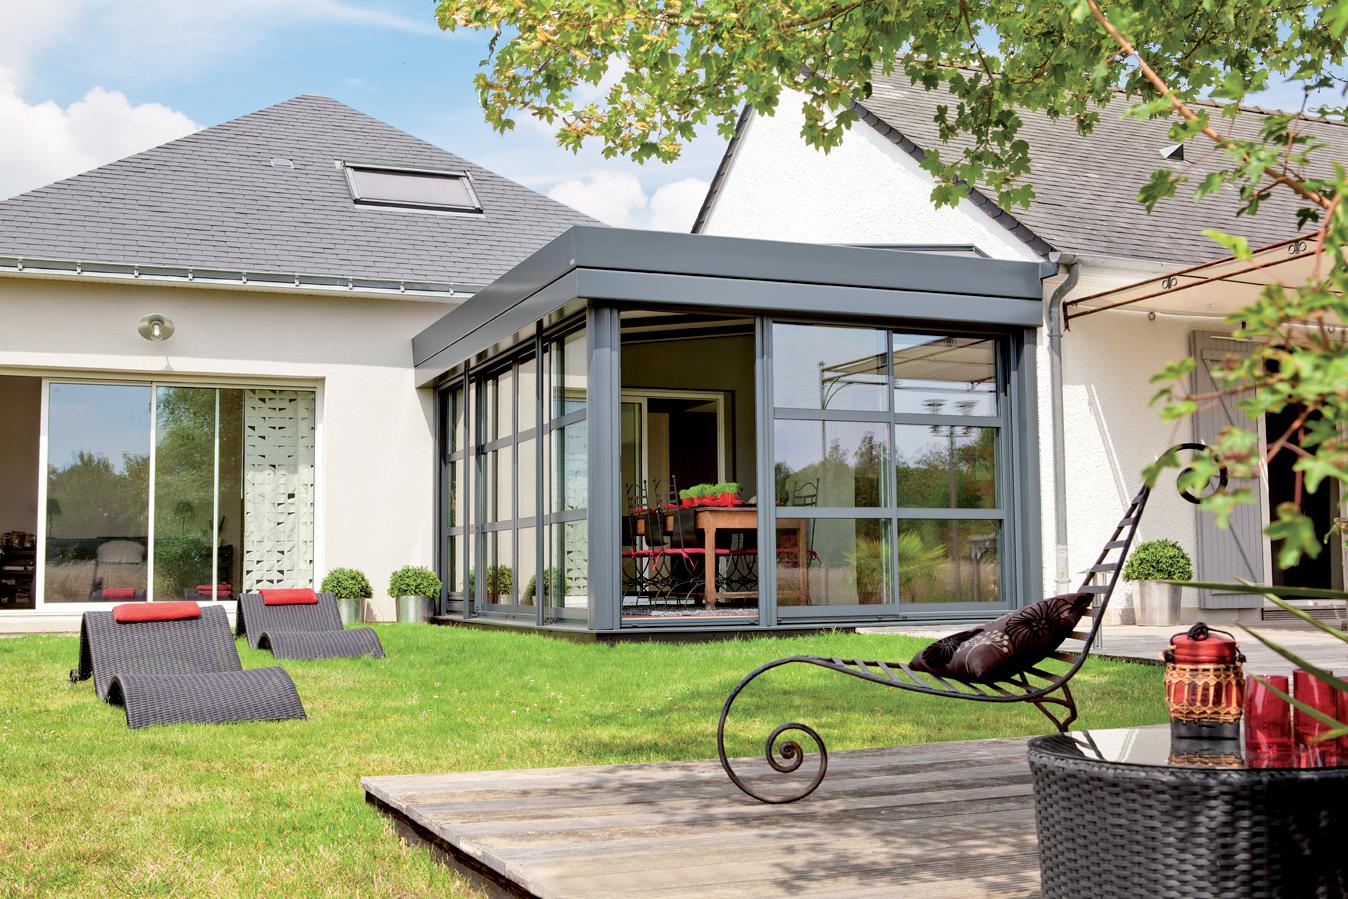 Extension maison veranda prix beautiful excellent extension maison veranda u caen u decore - La veranda caen ...